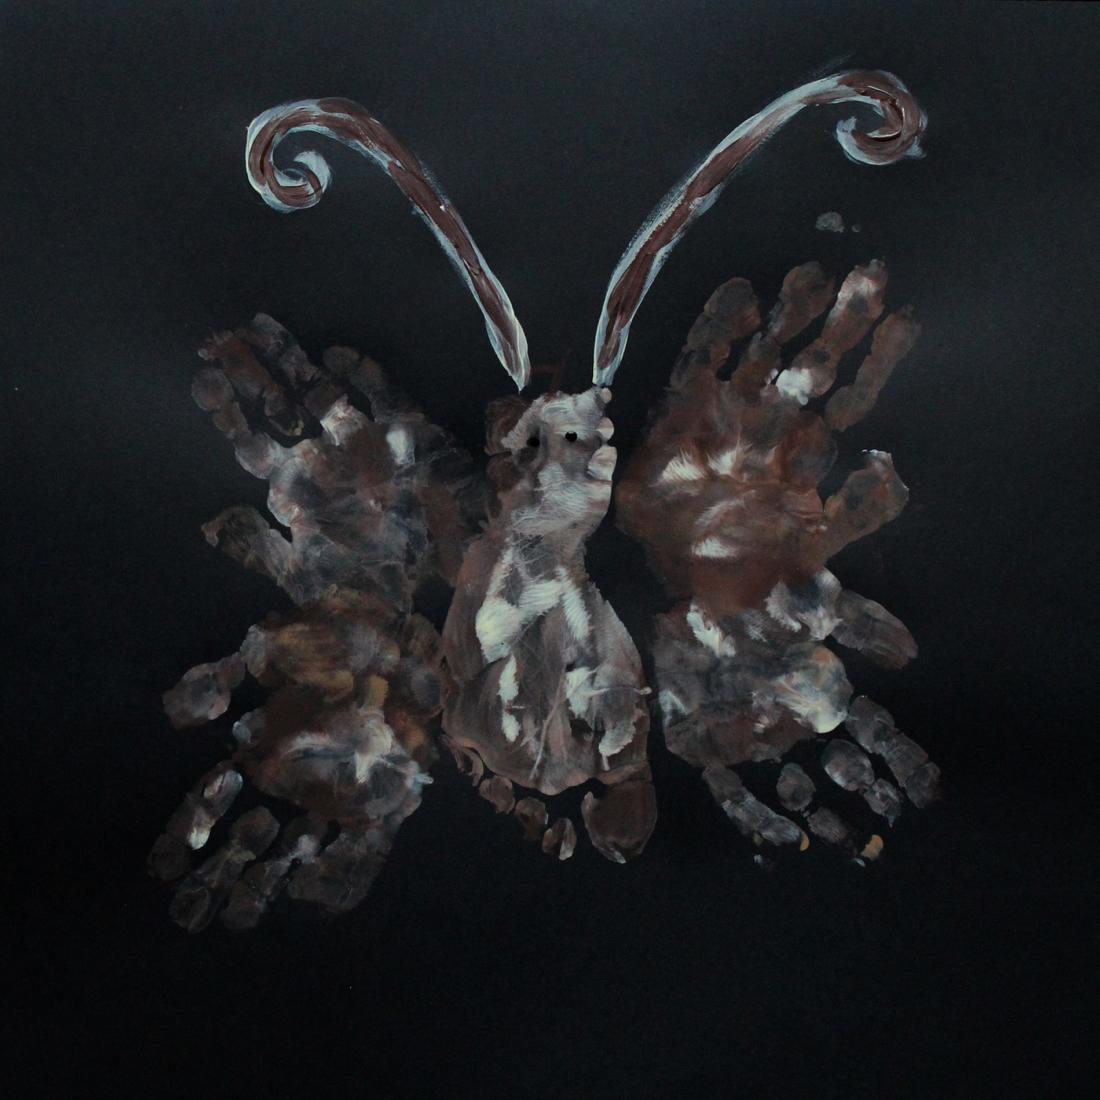 moth handpaint art